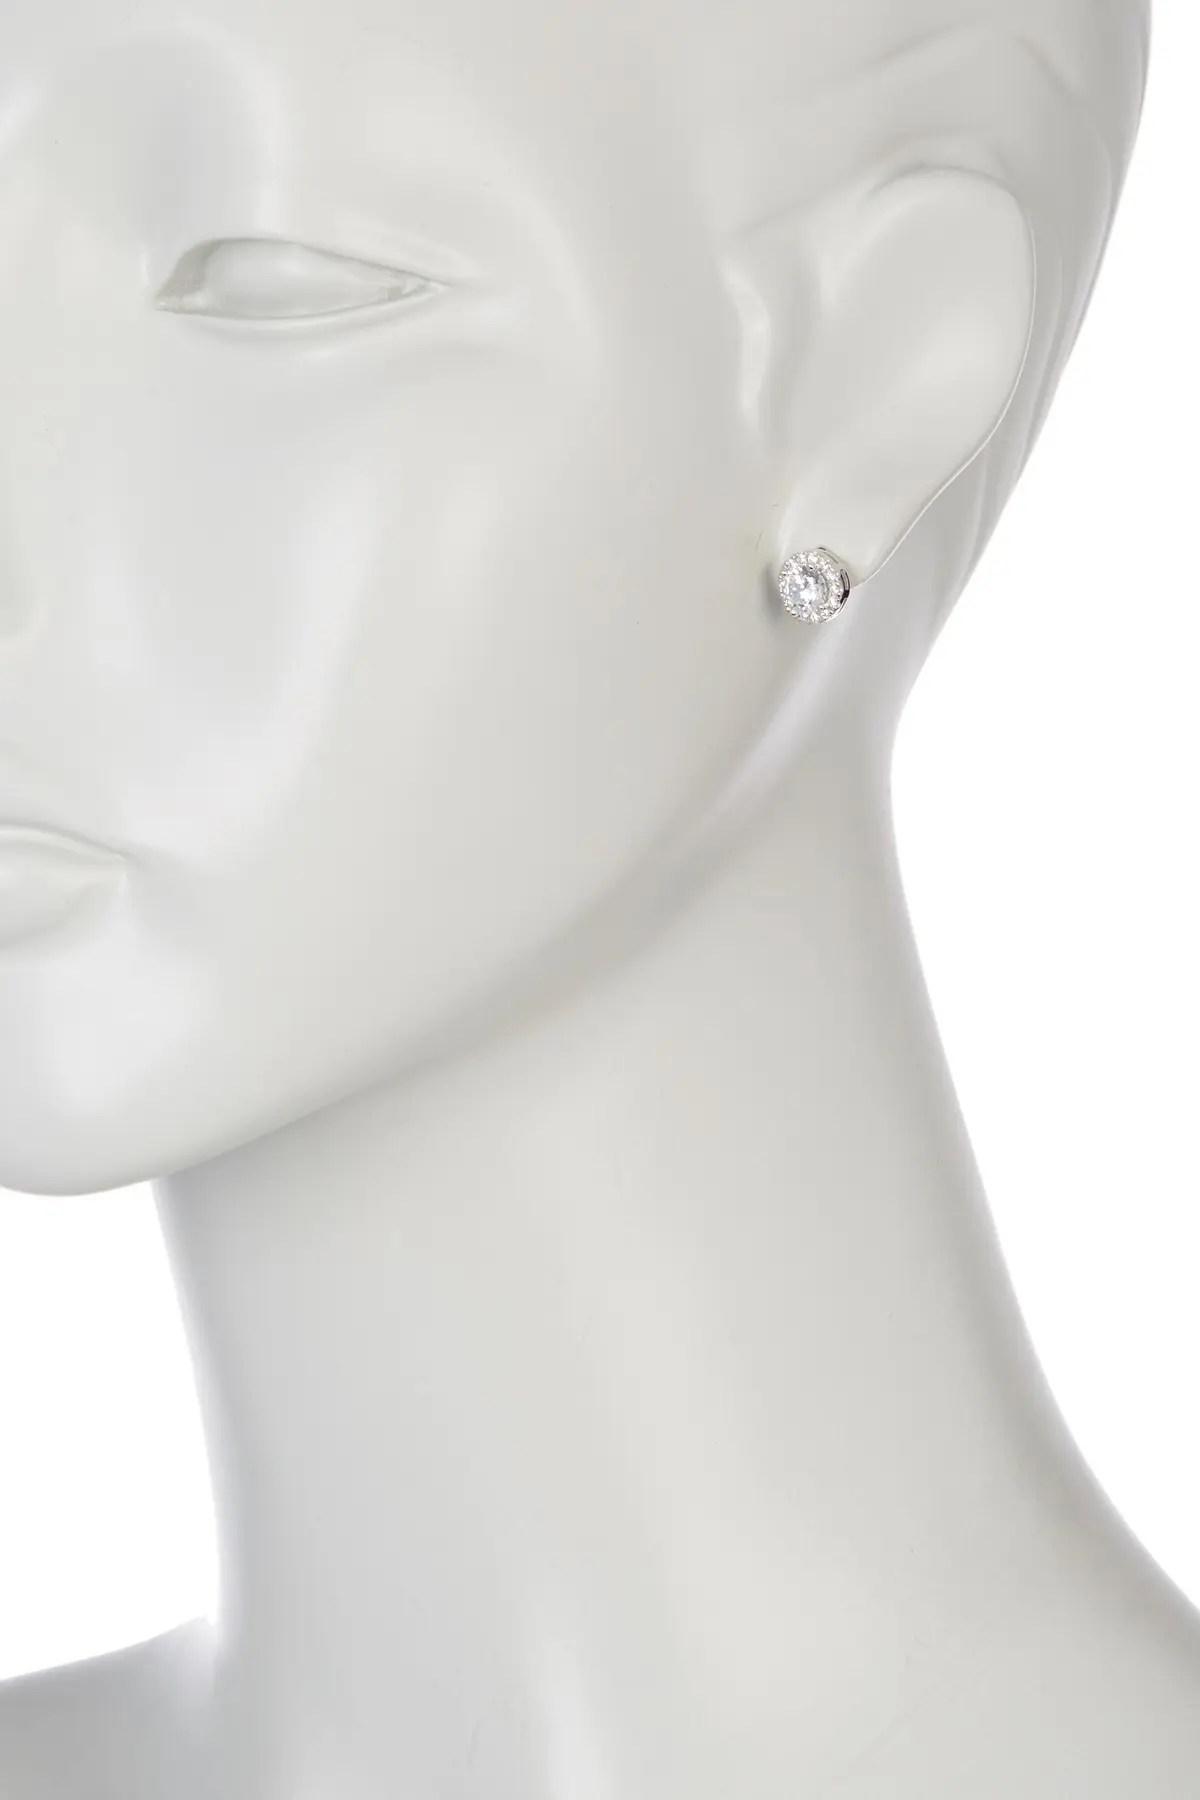 nordstrom rack sterling silver cz pave stud earrings nordstrom rack